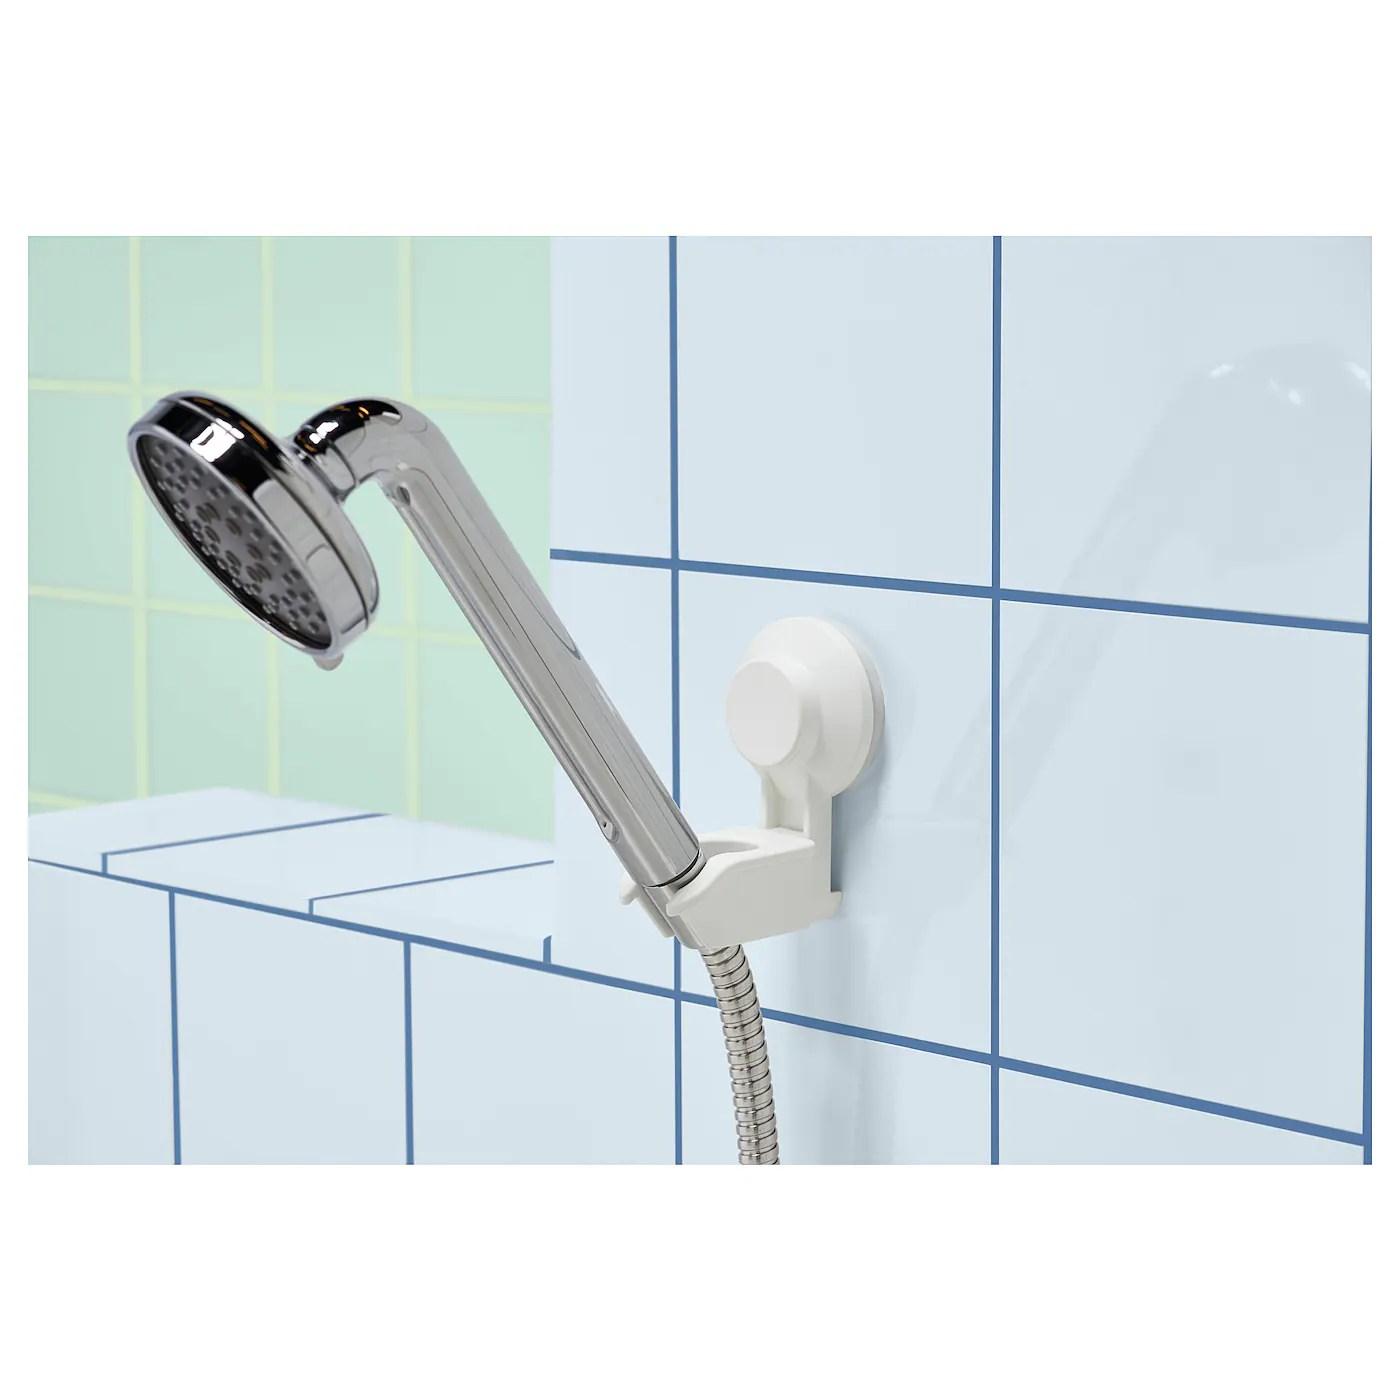 Handheld Shower Holder Suction Cup Tisken White